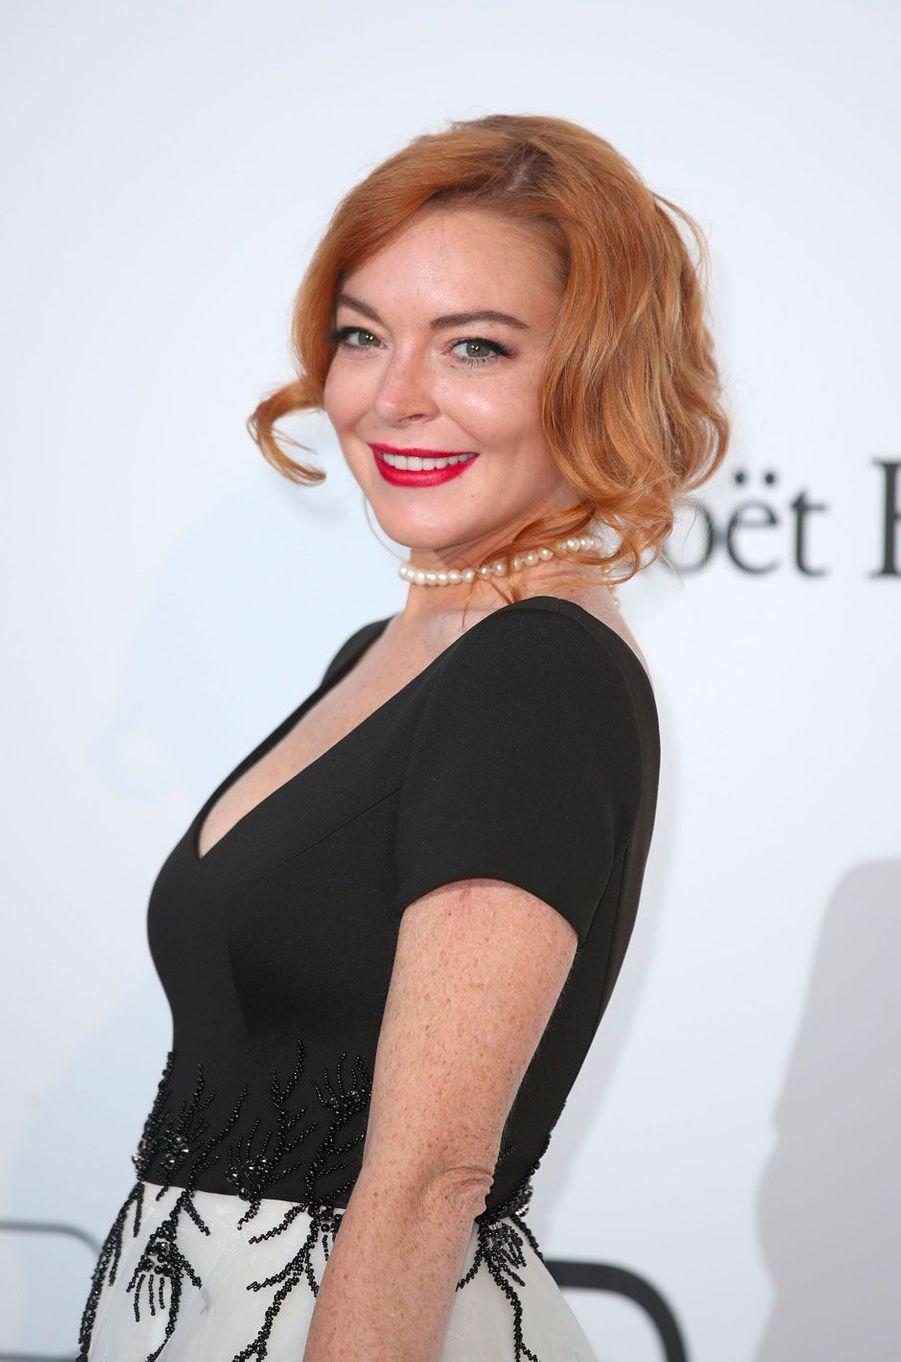 Lindsay Lohan maquillée